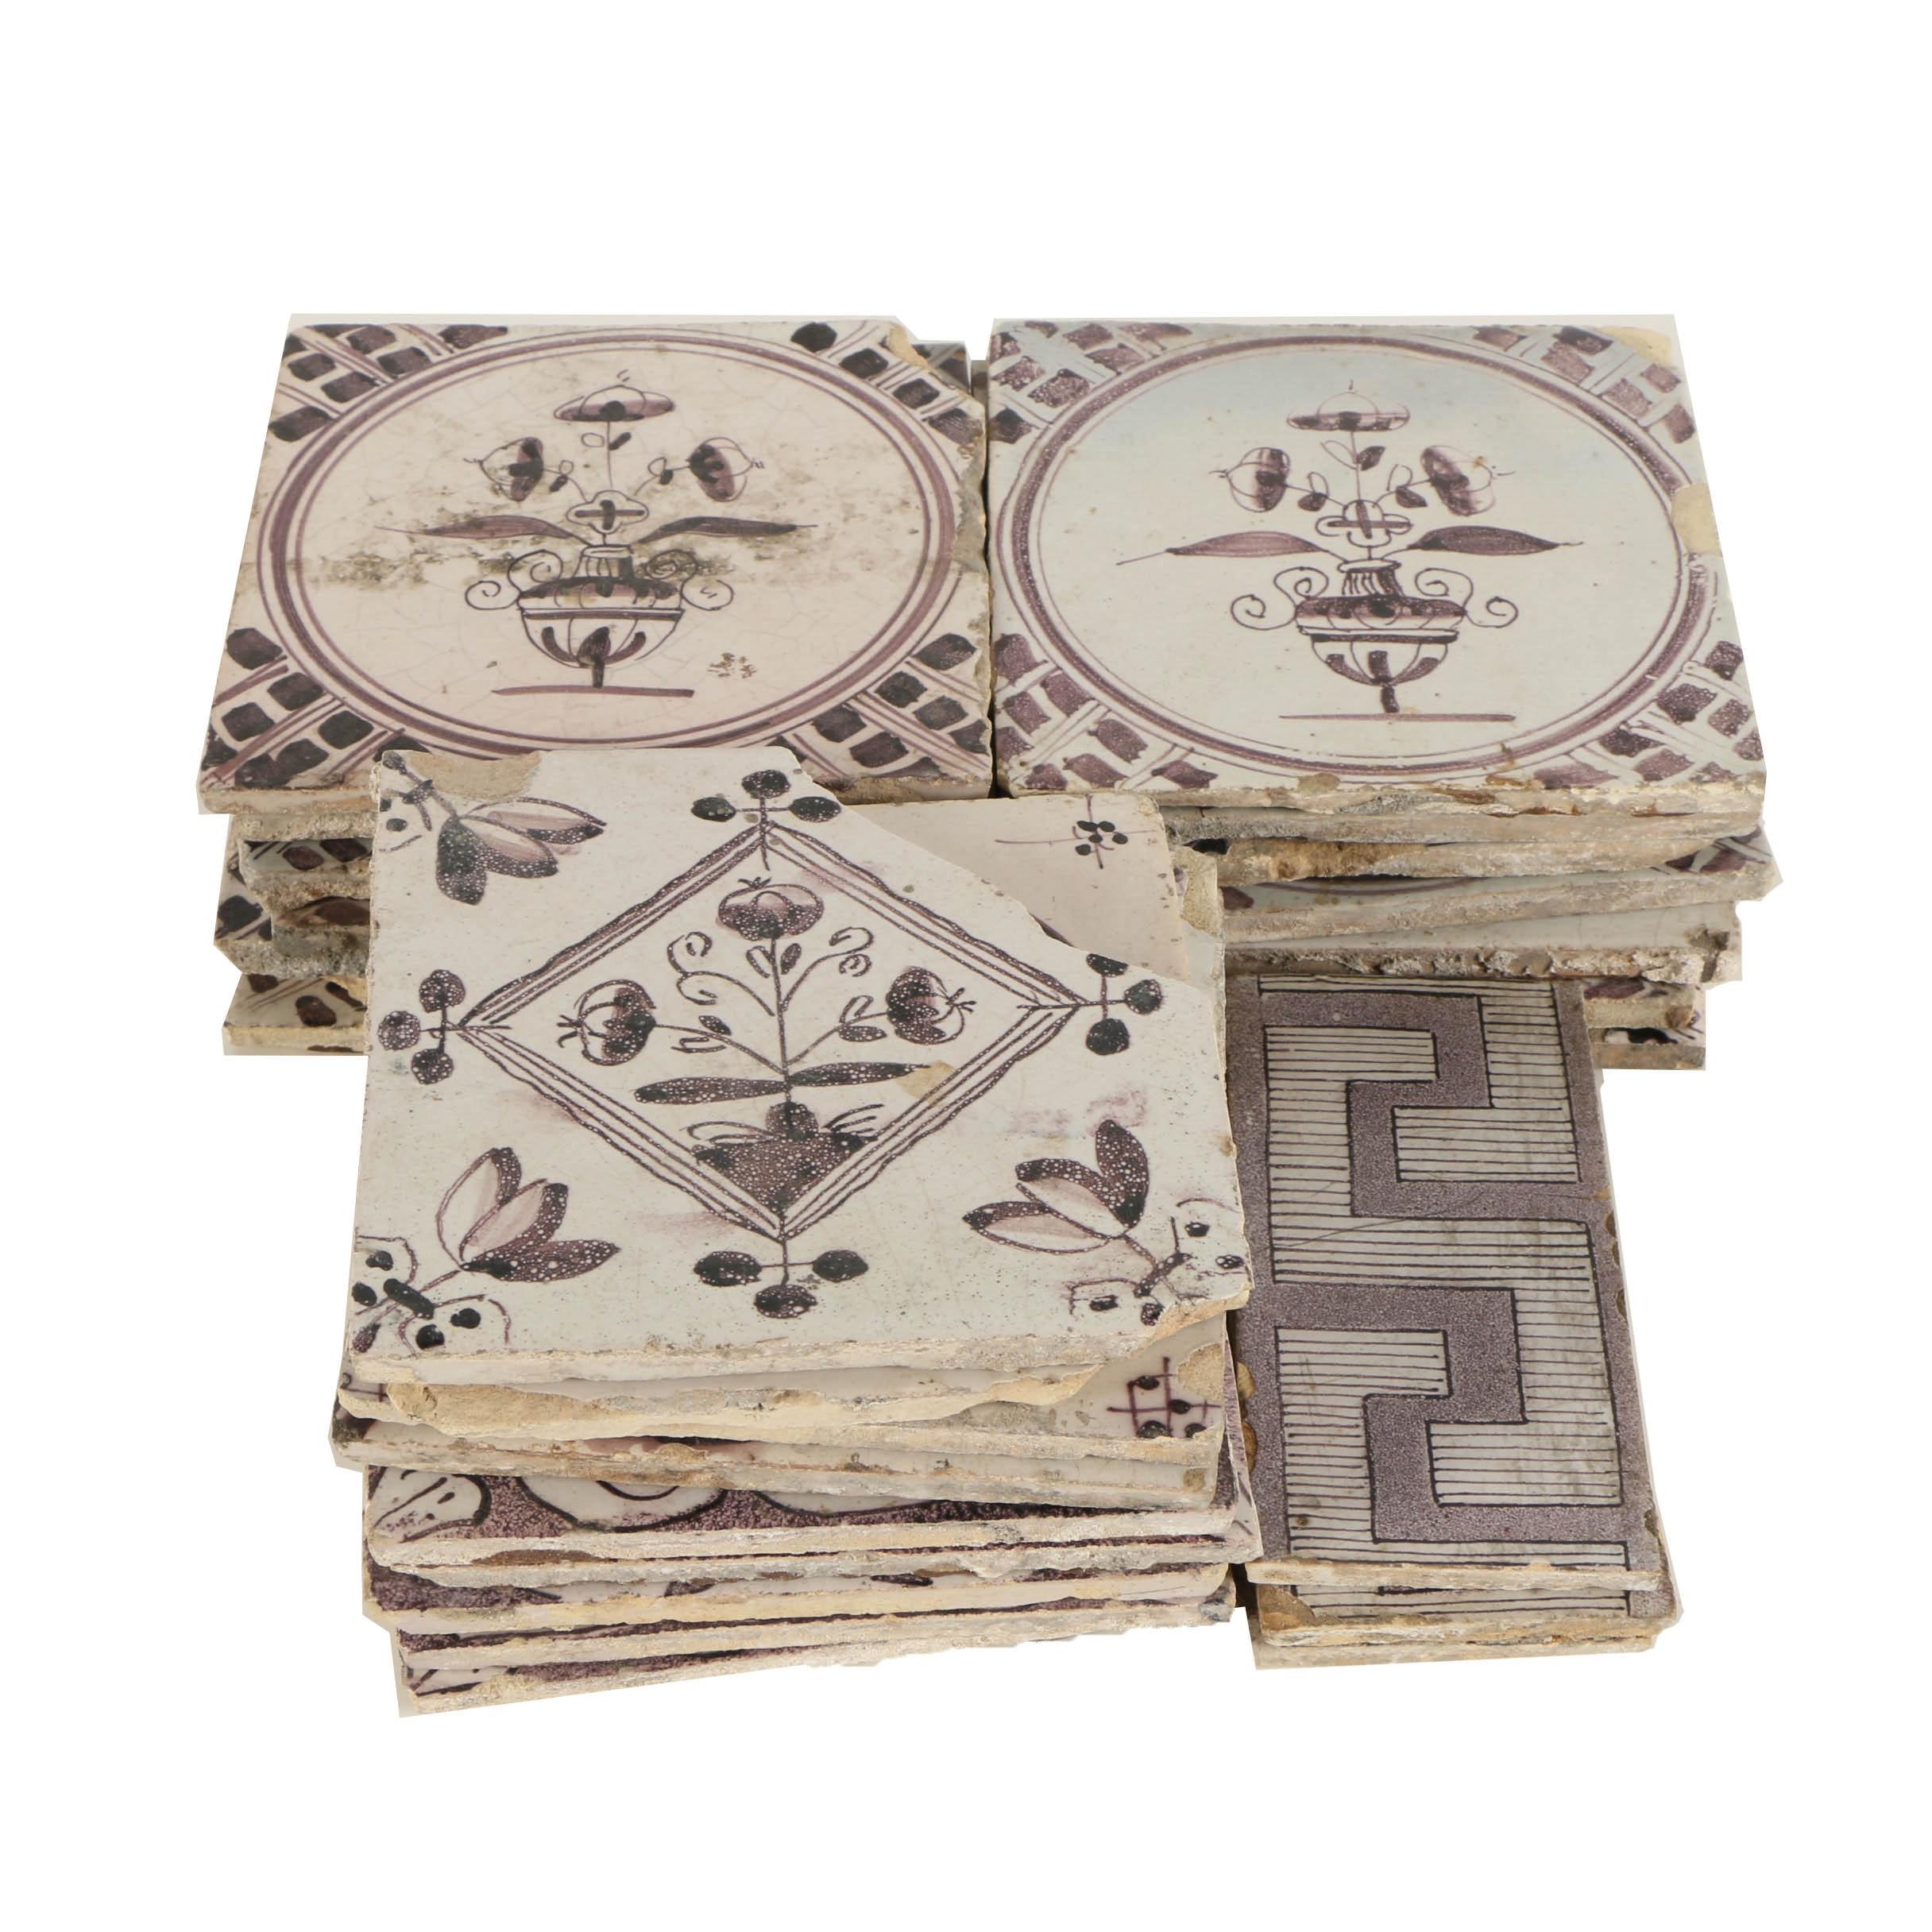 Twenty-One Antique Italian Hand Painted Ceramic Tiles